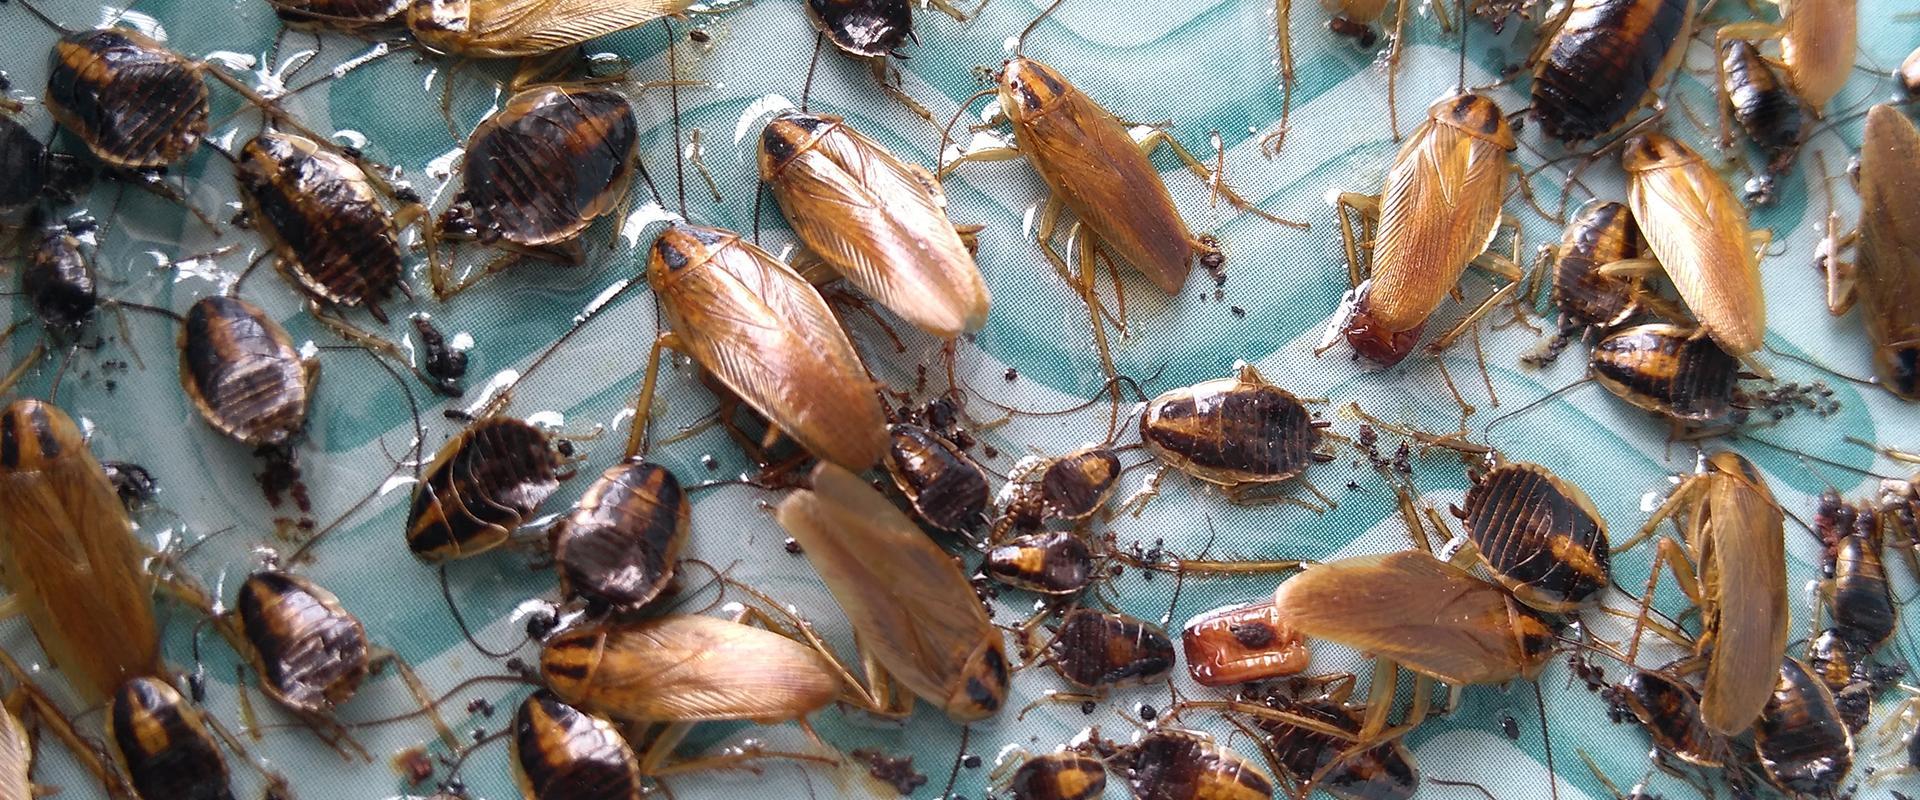 cockroaches on glue board in fayetteville georgia